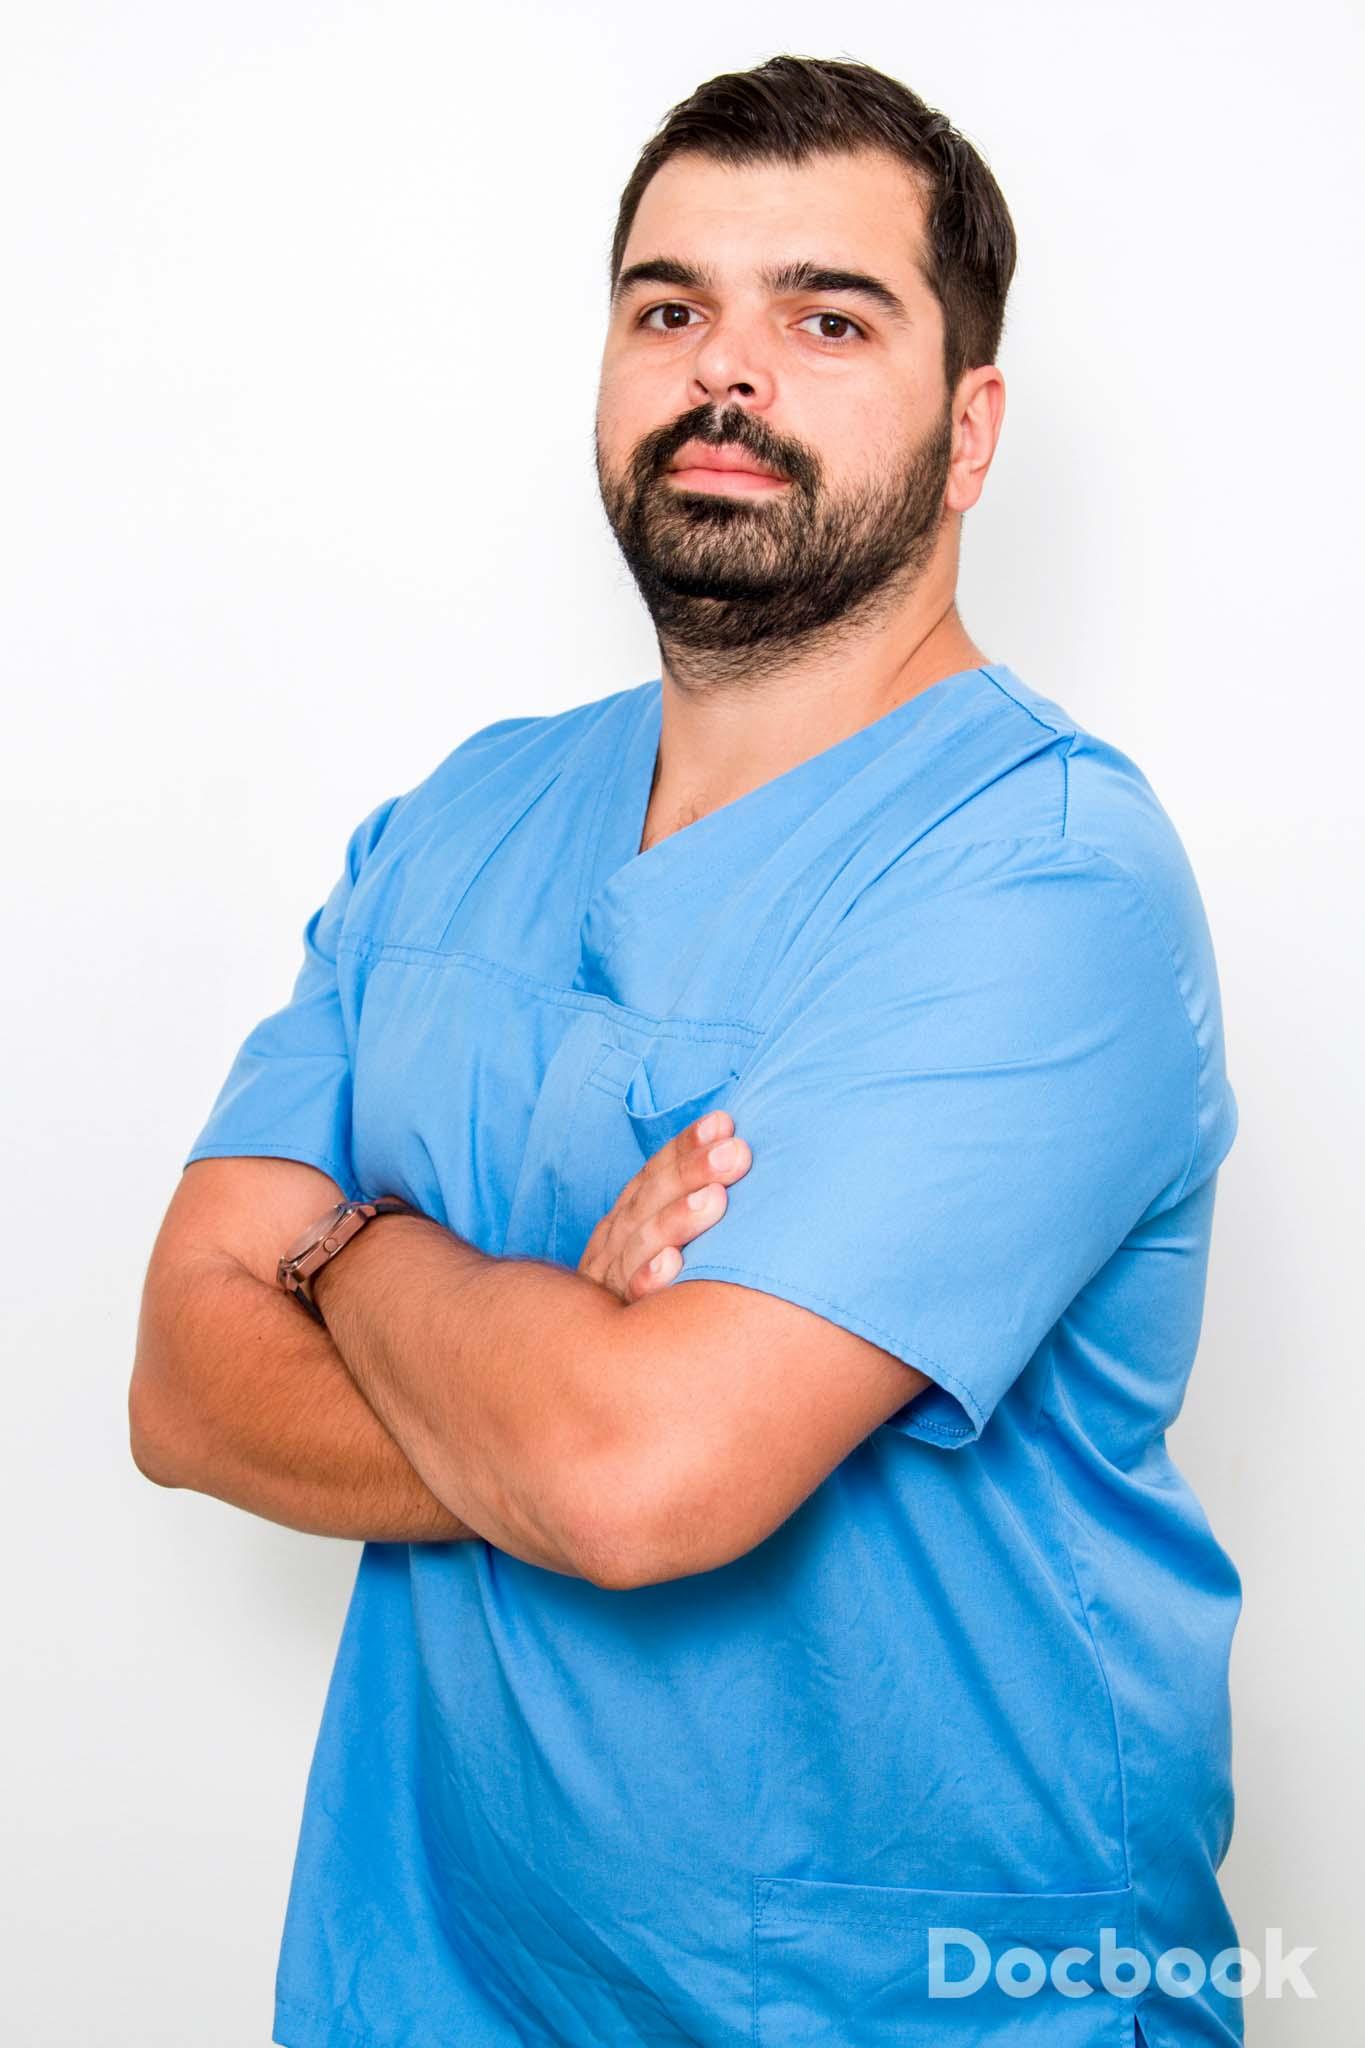 Dr. Robert Sirbu